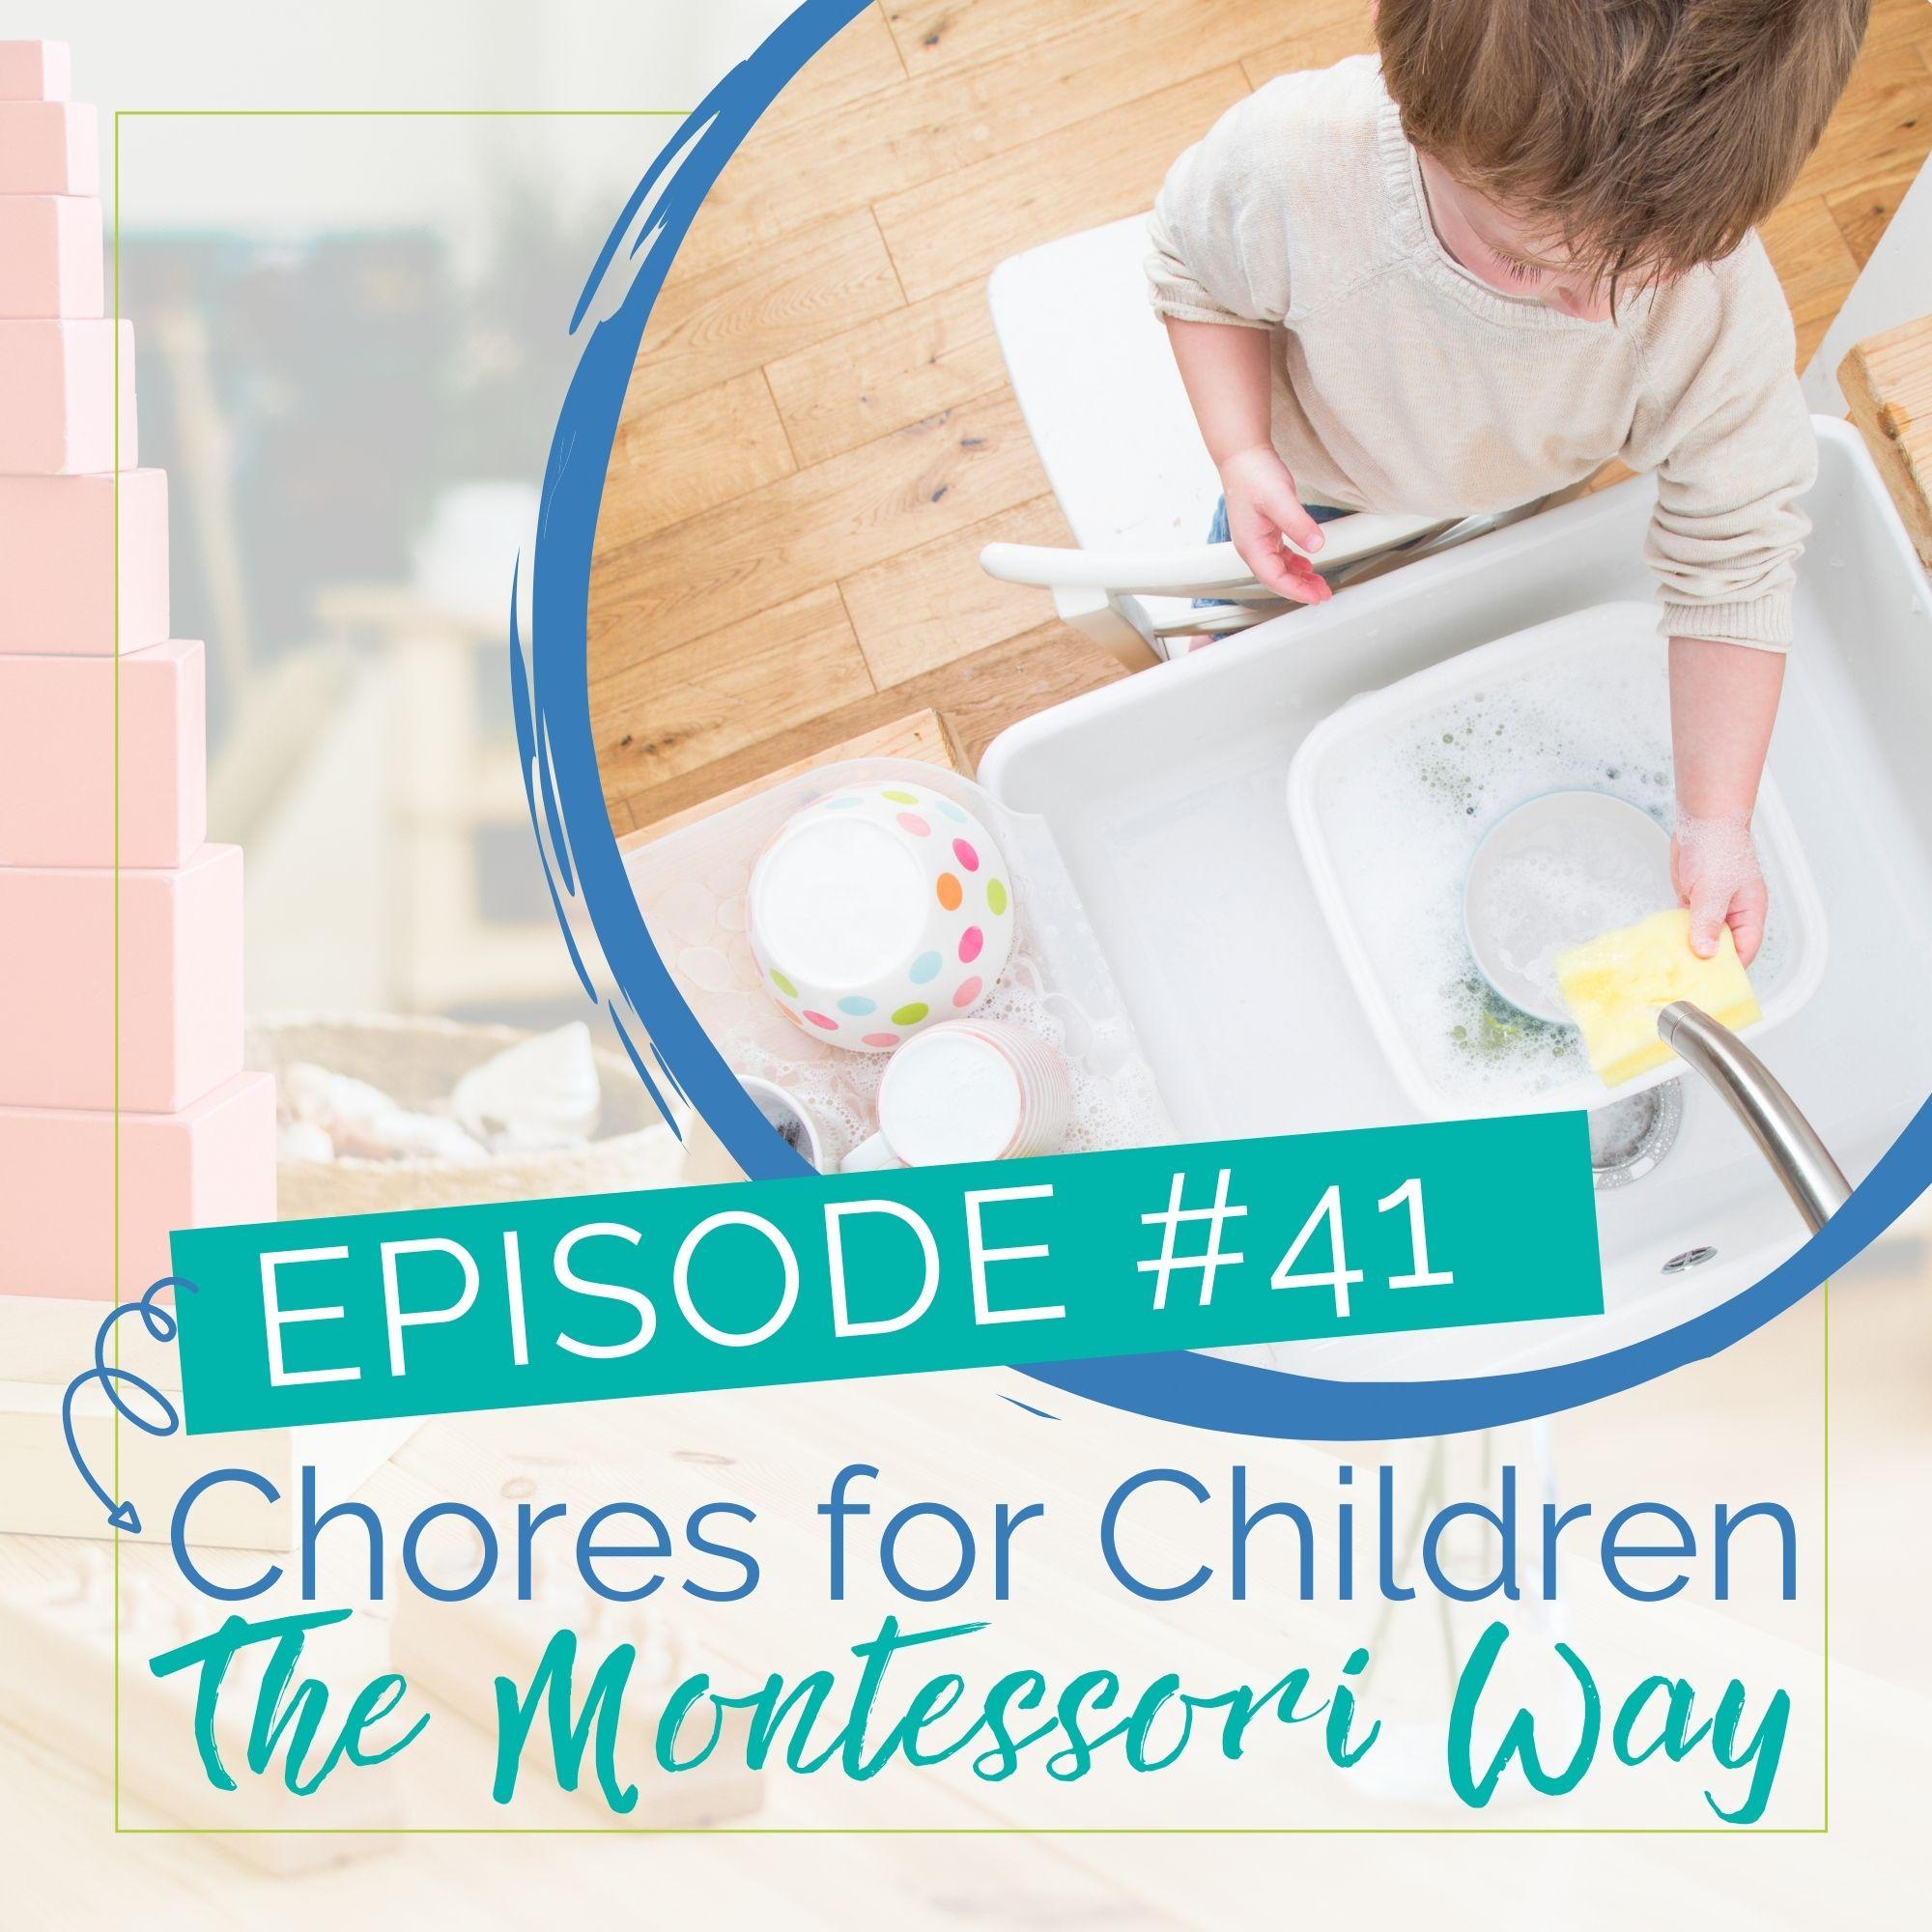 Episode 41: Chores for Children the Montessori Way show art